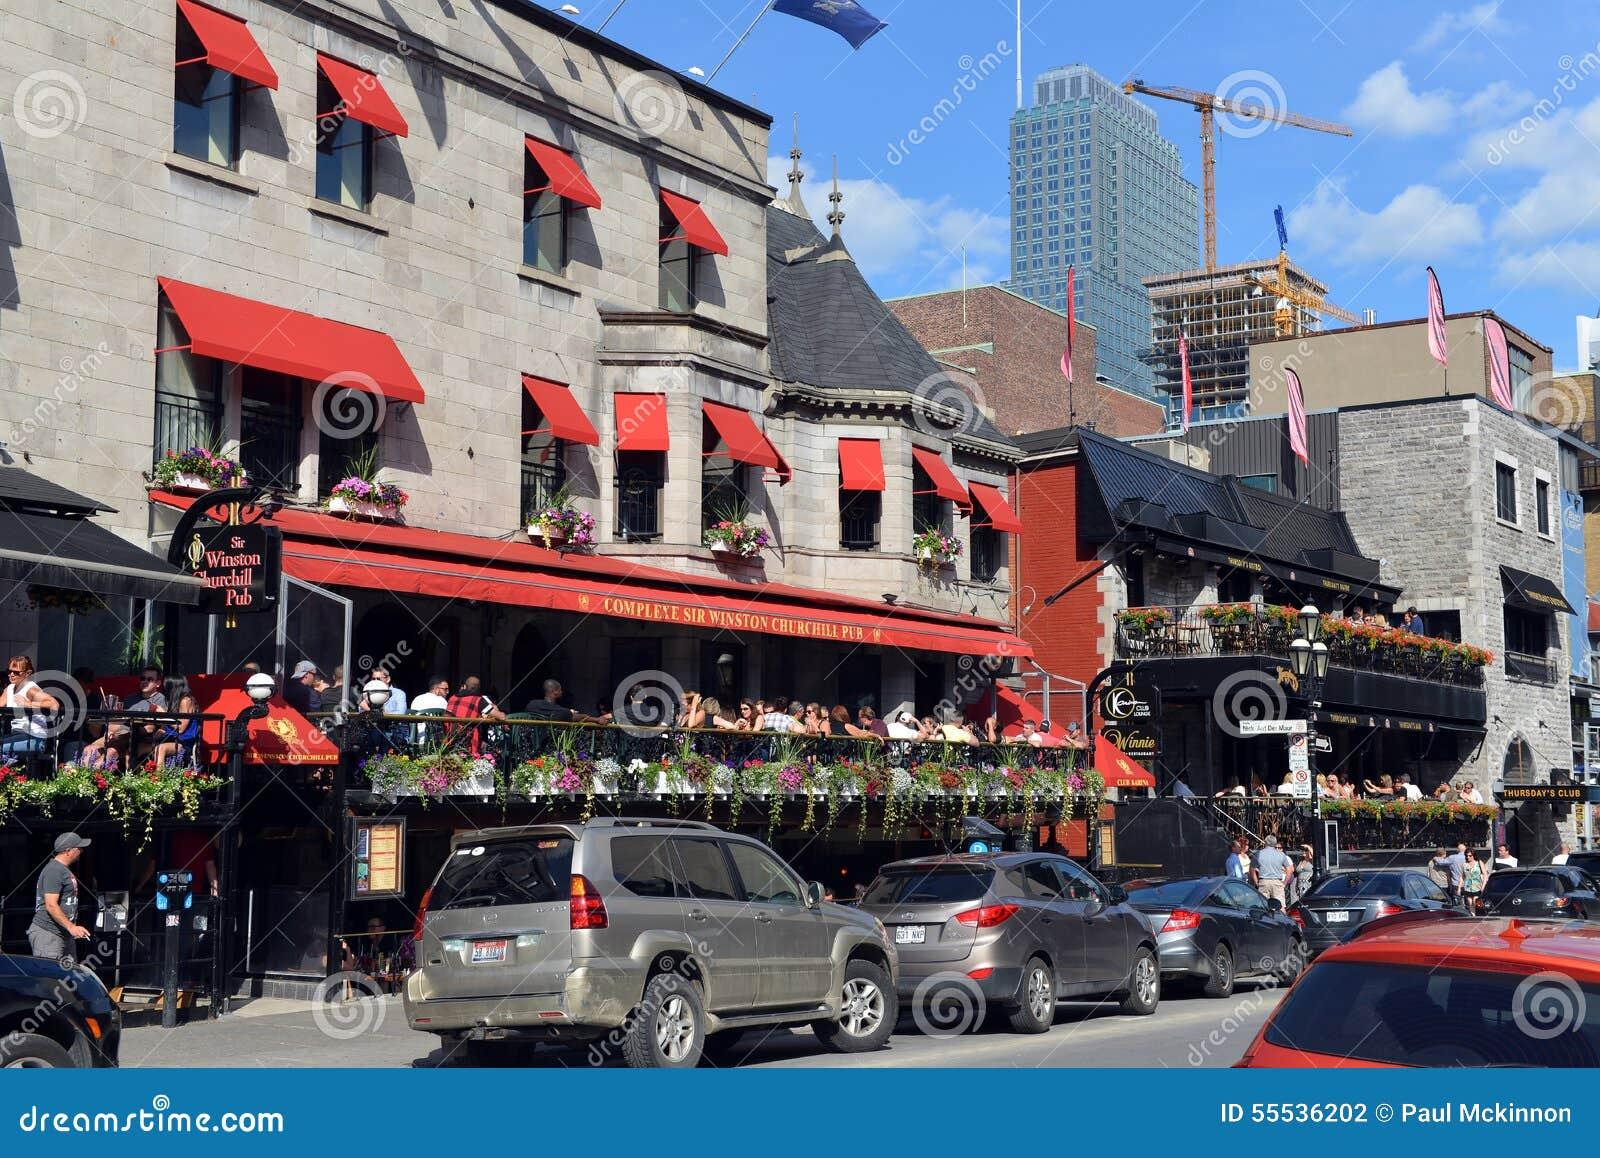 Sir Winston Churchill Pub